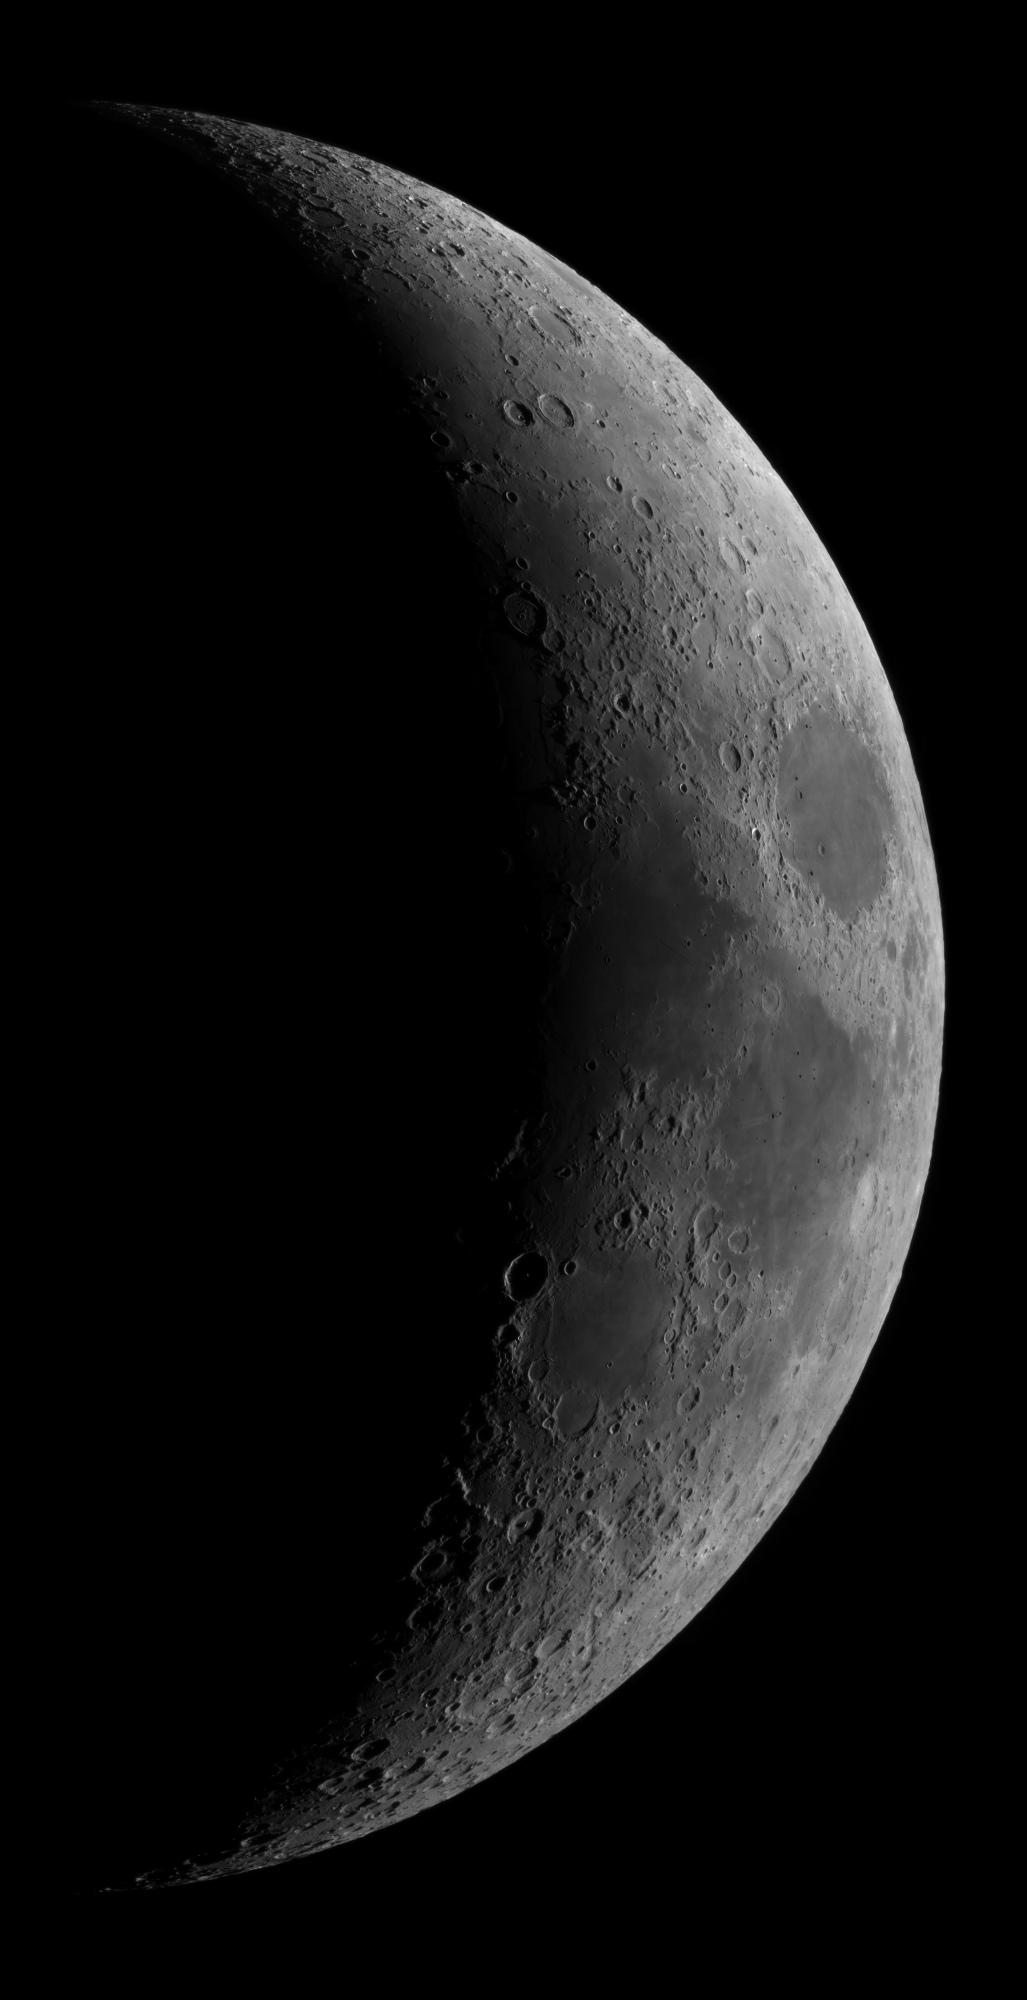 5c8a6869d5265_lune110319(70).thumb.jpg.cd5eab73712003e115ee74887147b081.jpg